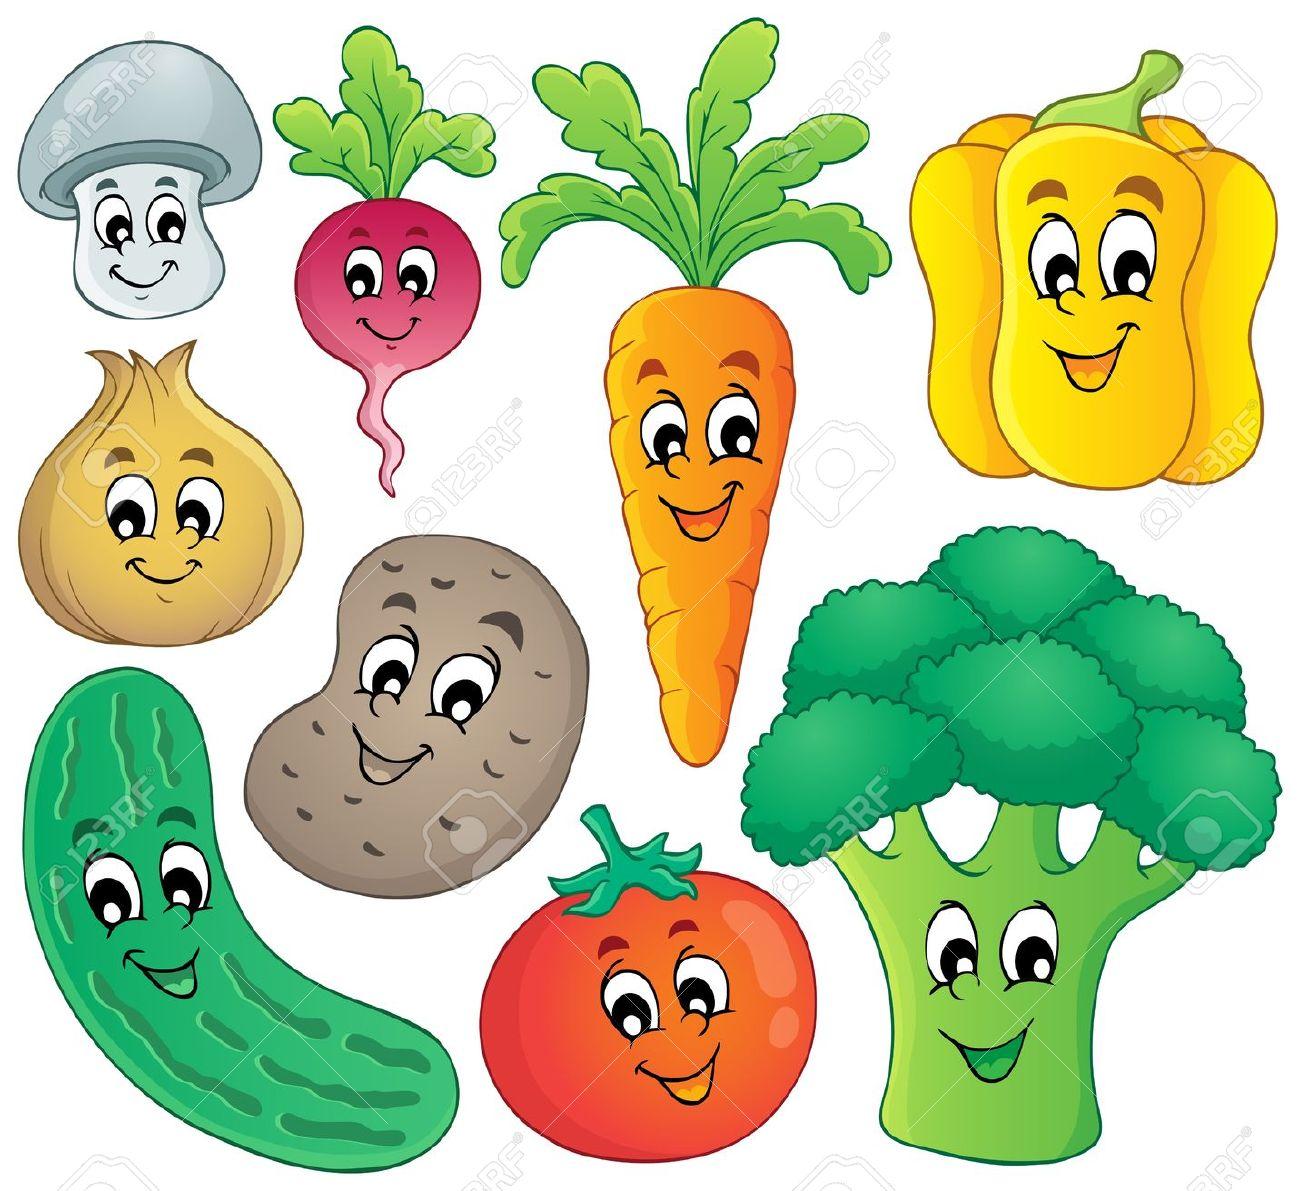 Free fresh download clip. Clipart vegetables vegy